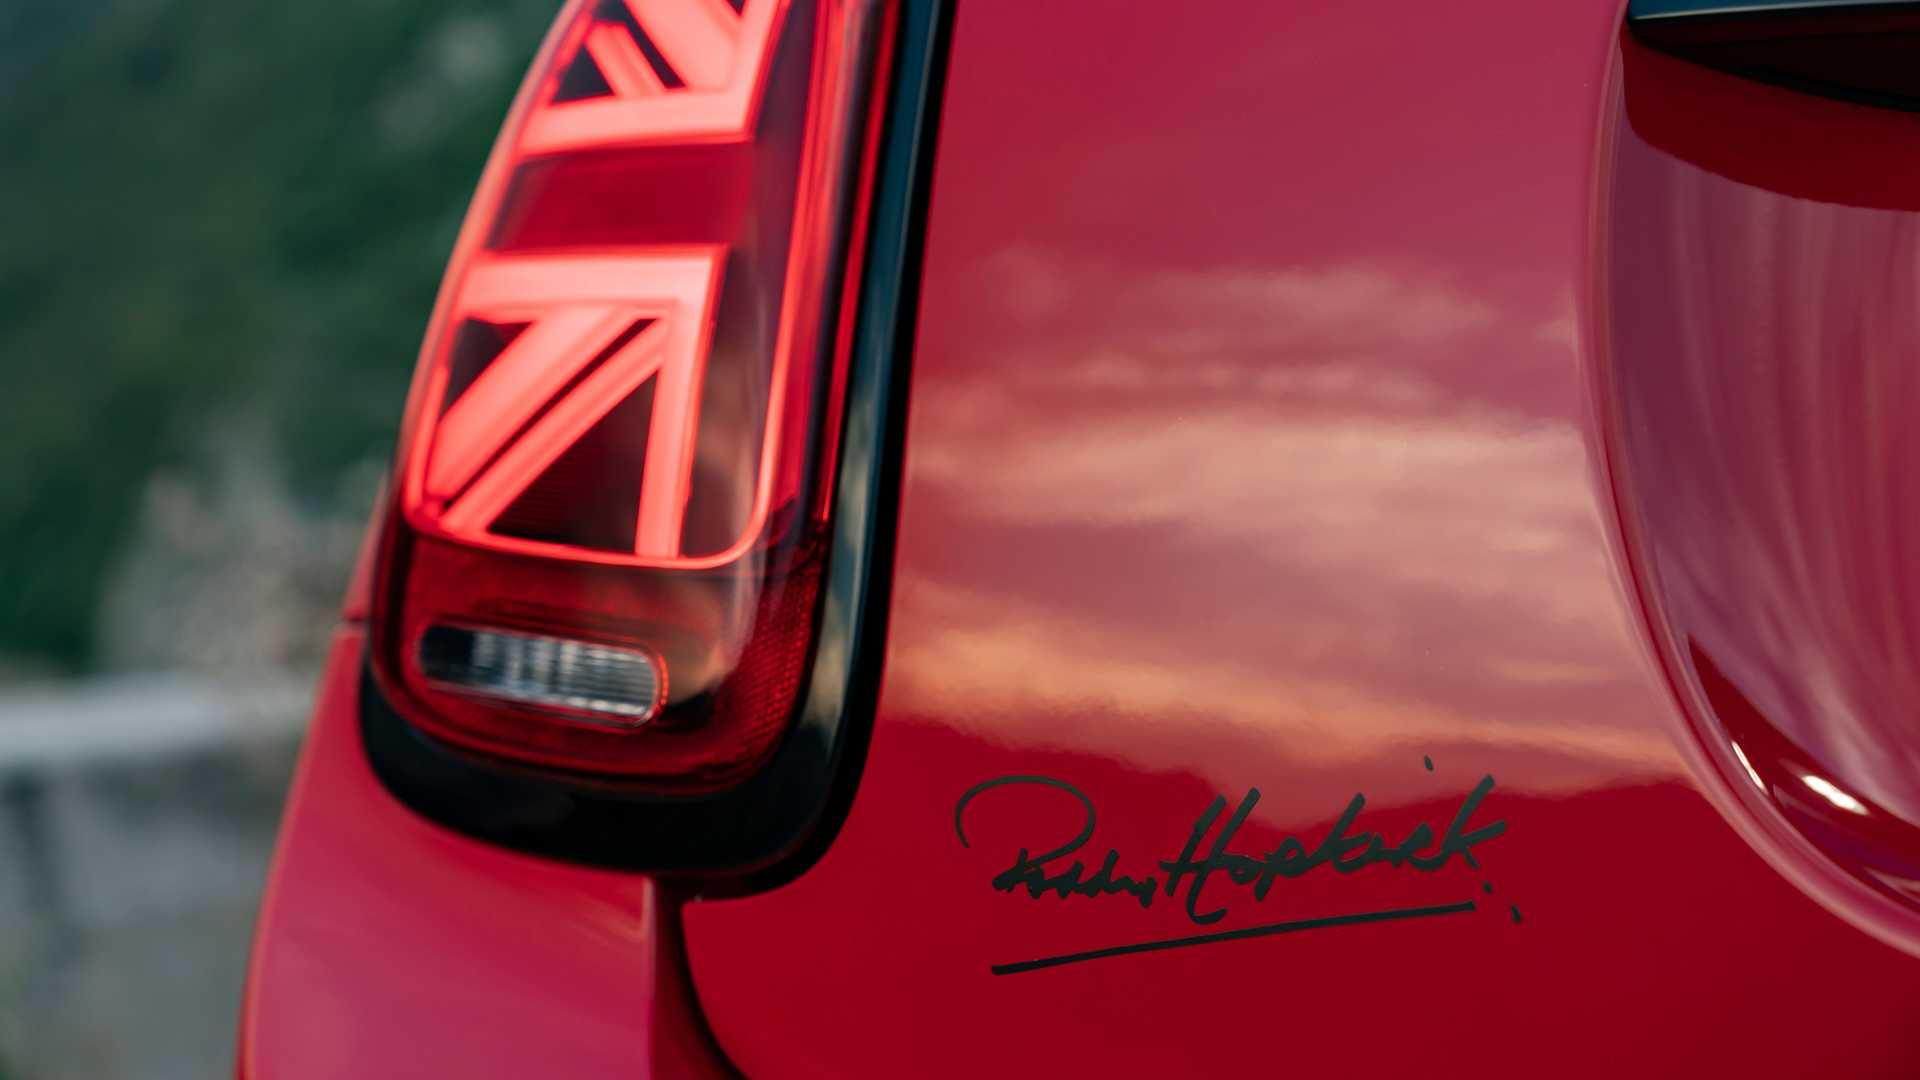 Firma del piloto original en el maletero del MINI Paddy Hopkirk Edition